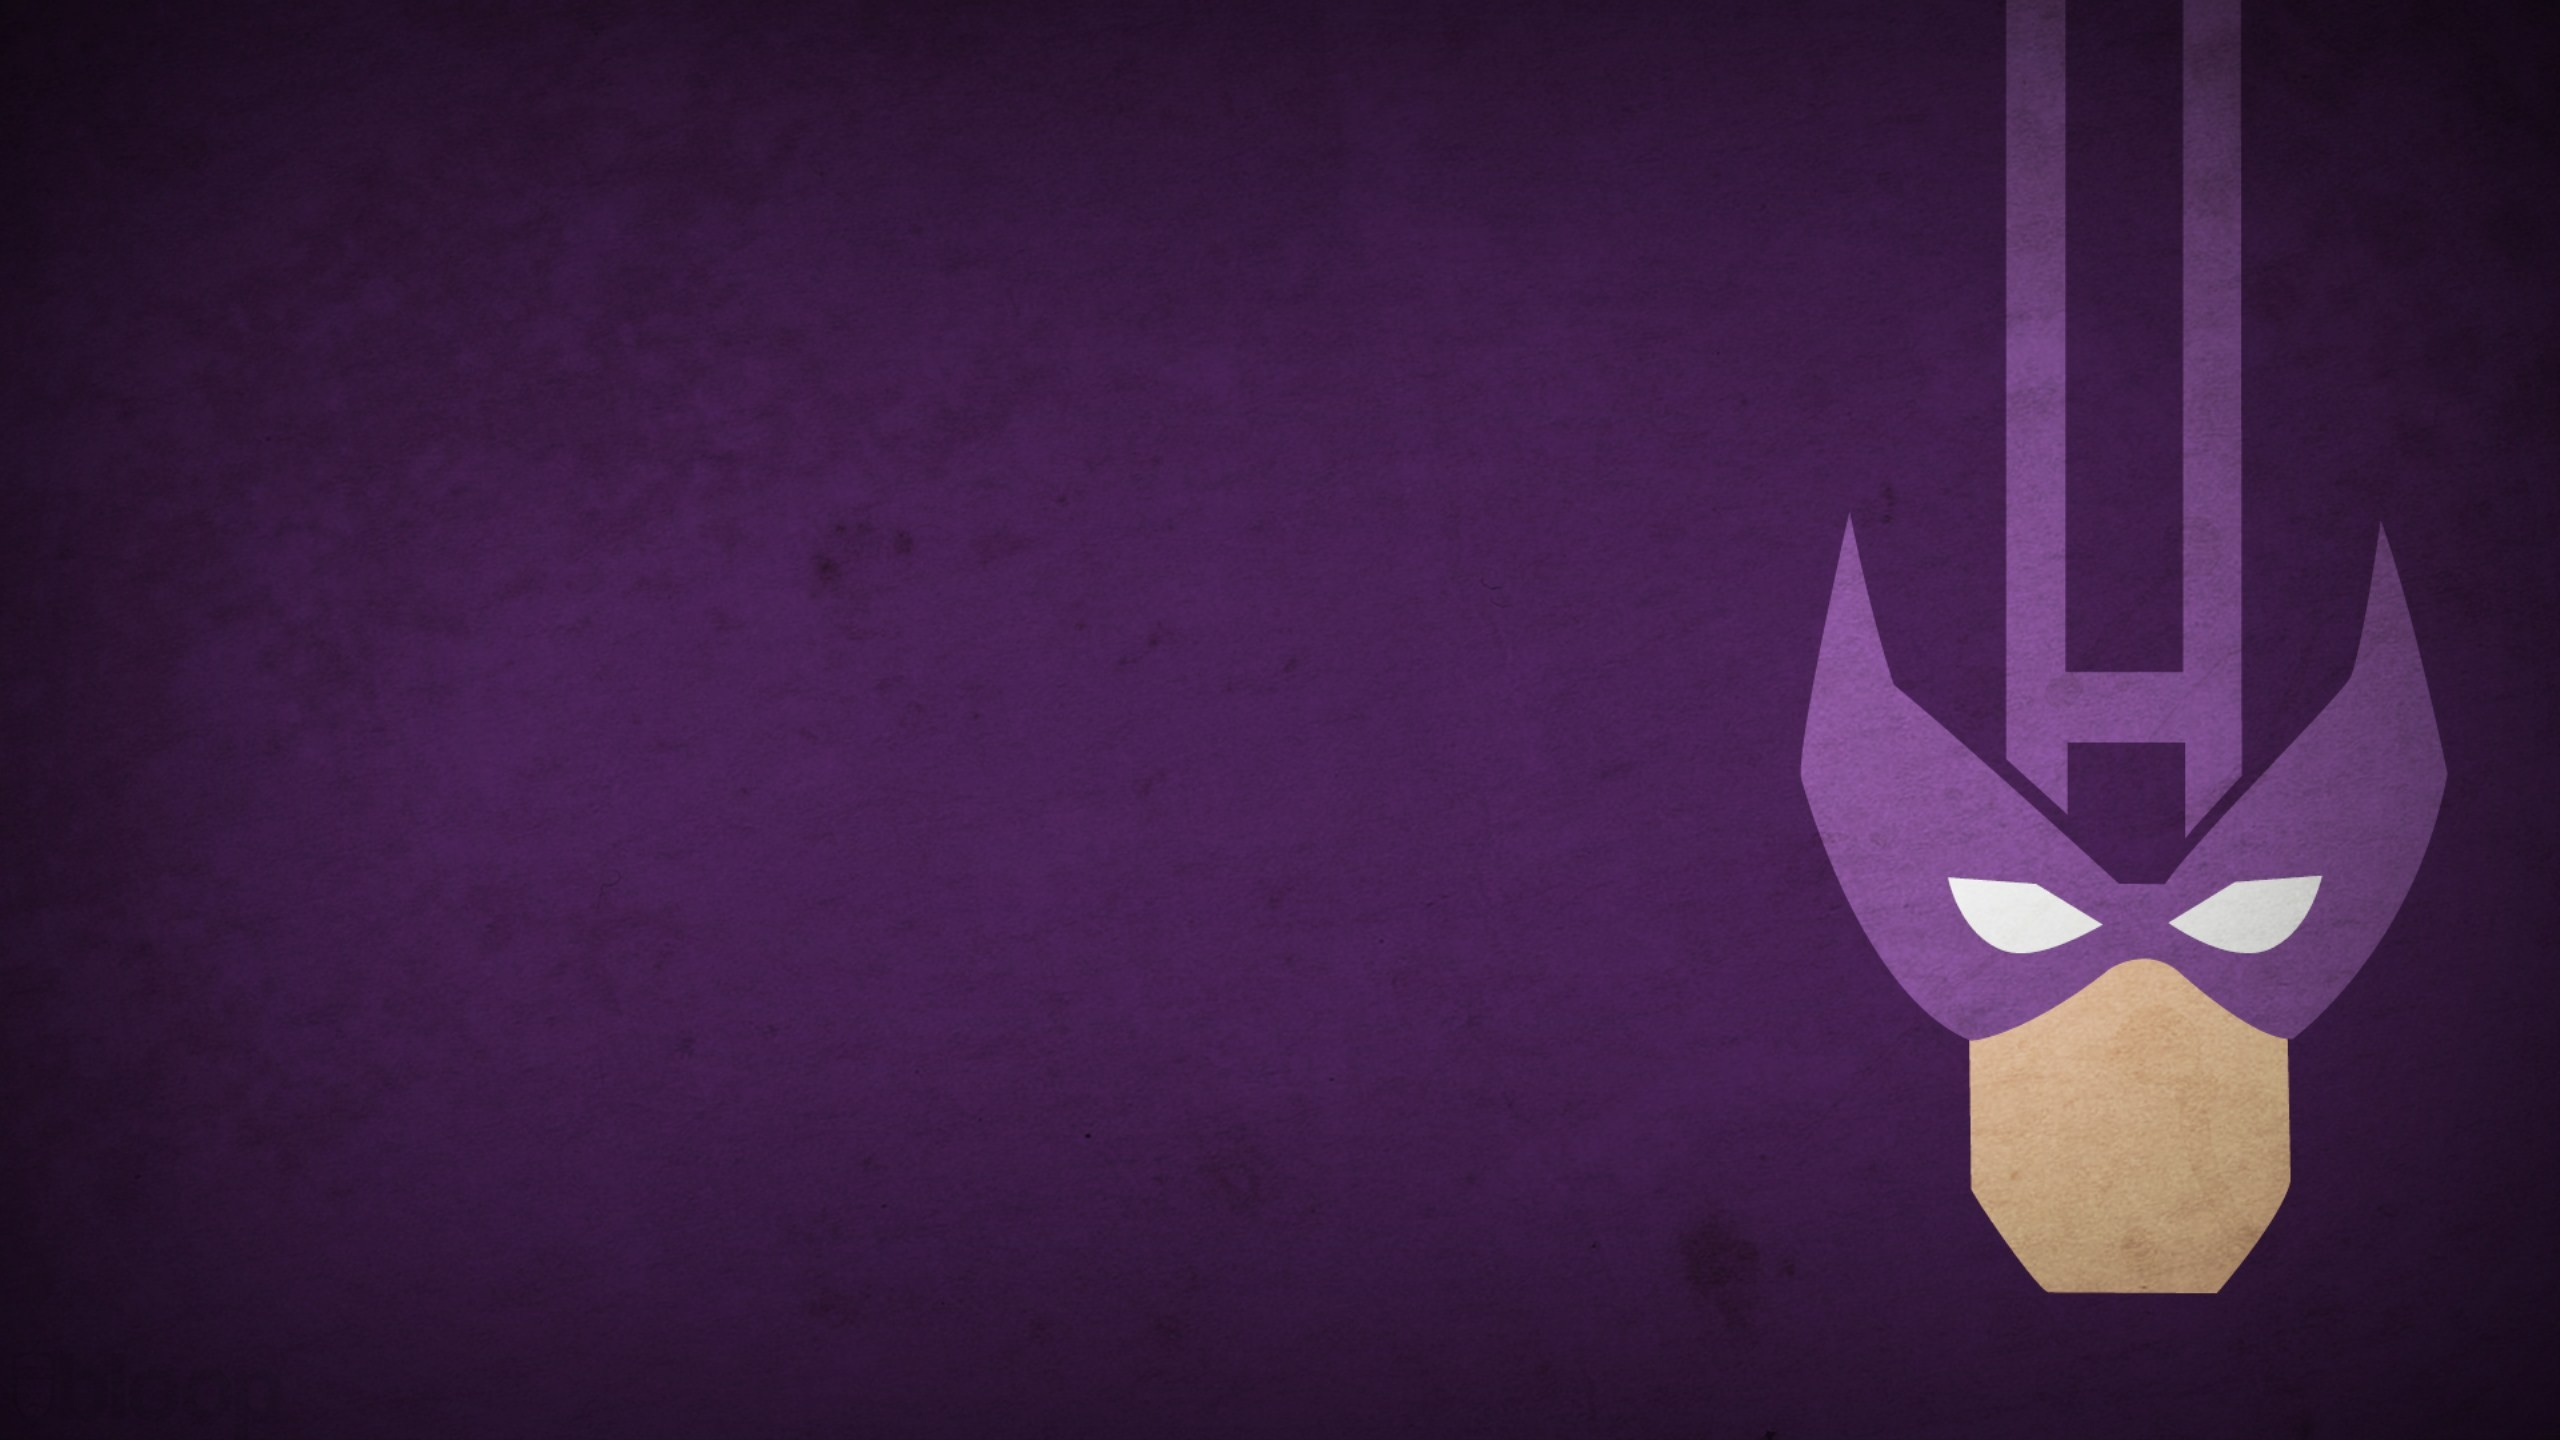 Marvel Comics Hawkeye purple background blo0p wallpaper background 2560x1440